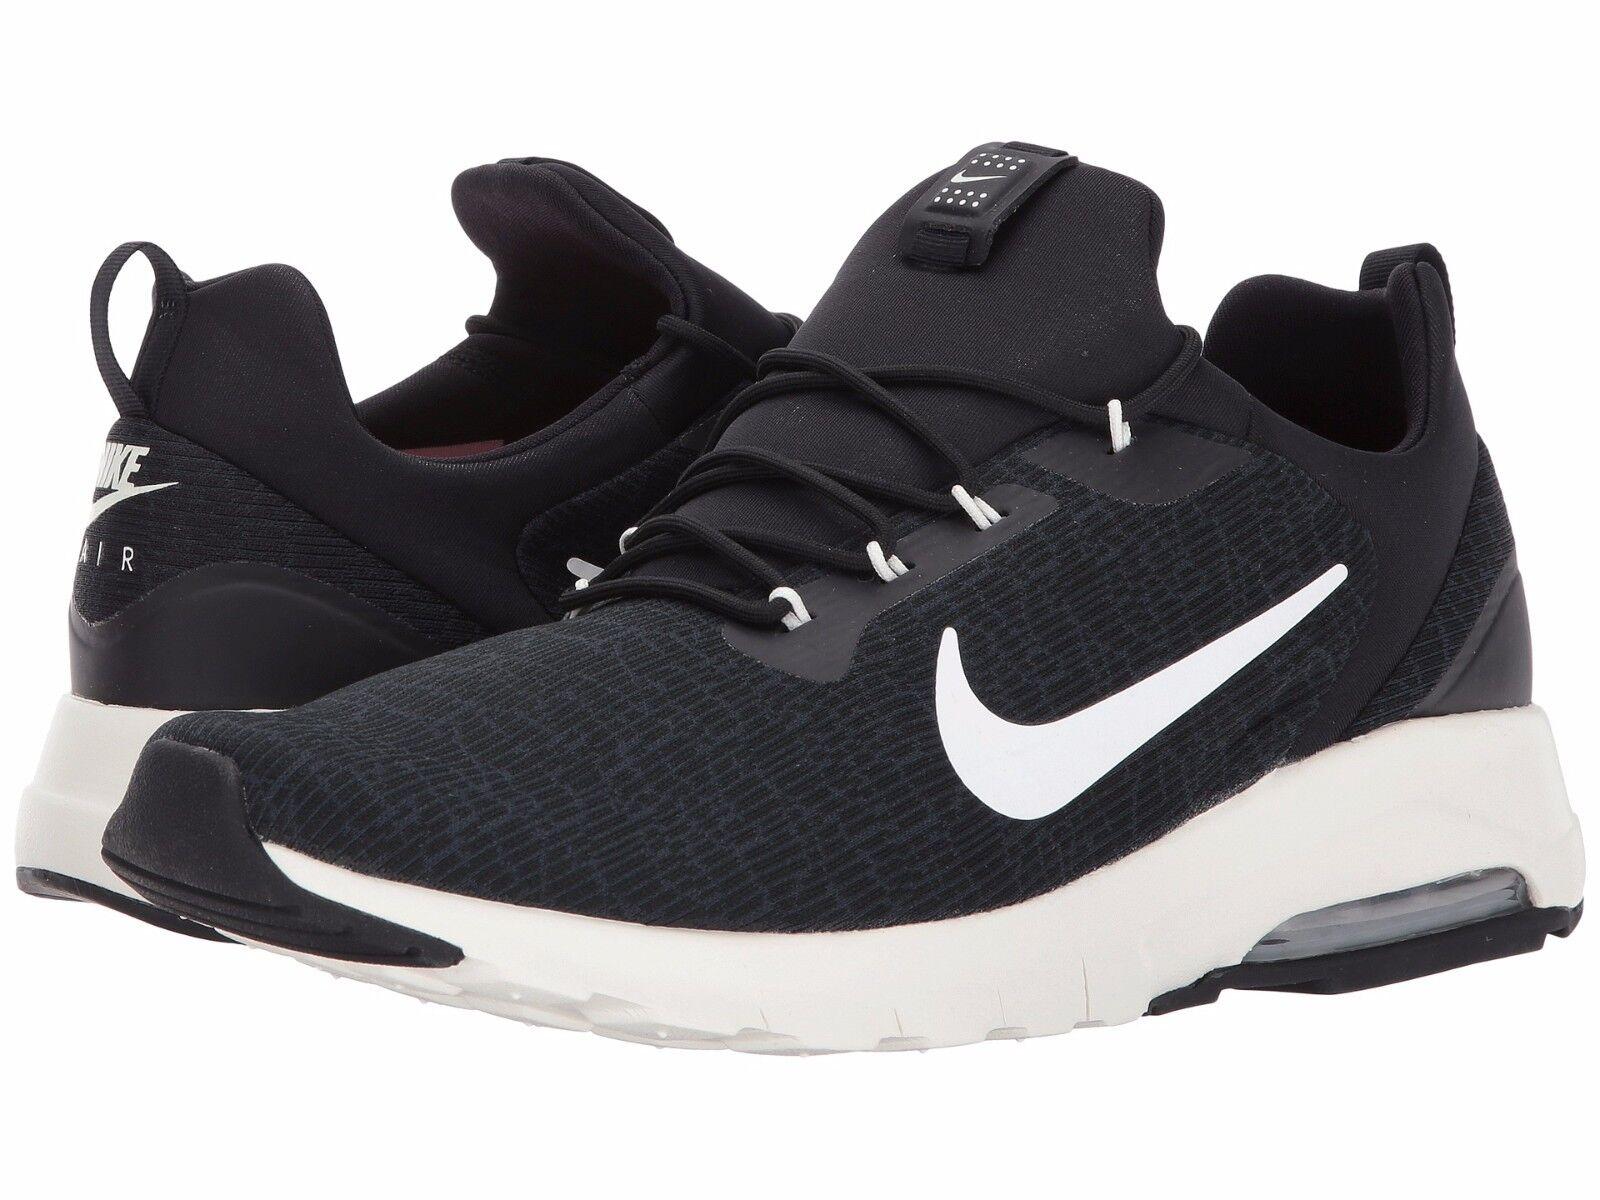 916771-001 Men's Nike Air Max Motion Racer Running Black/Sail Sizes 8-12 NIB